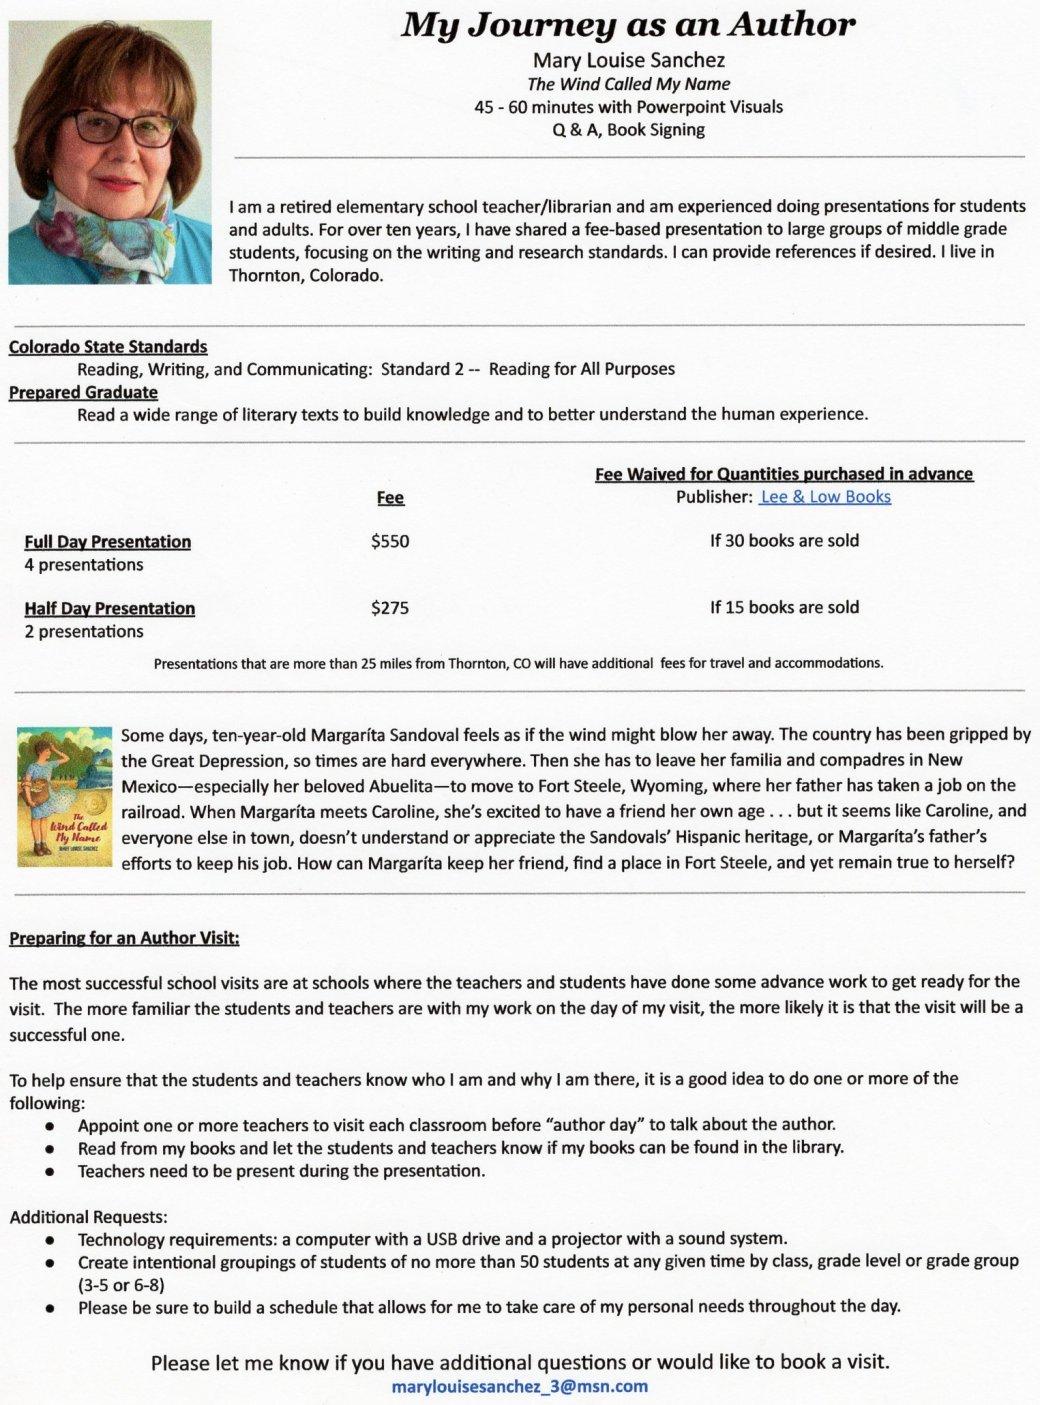 Author pricing TWCMN